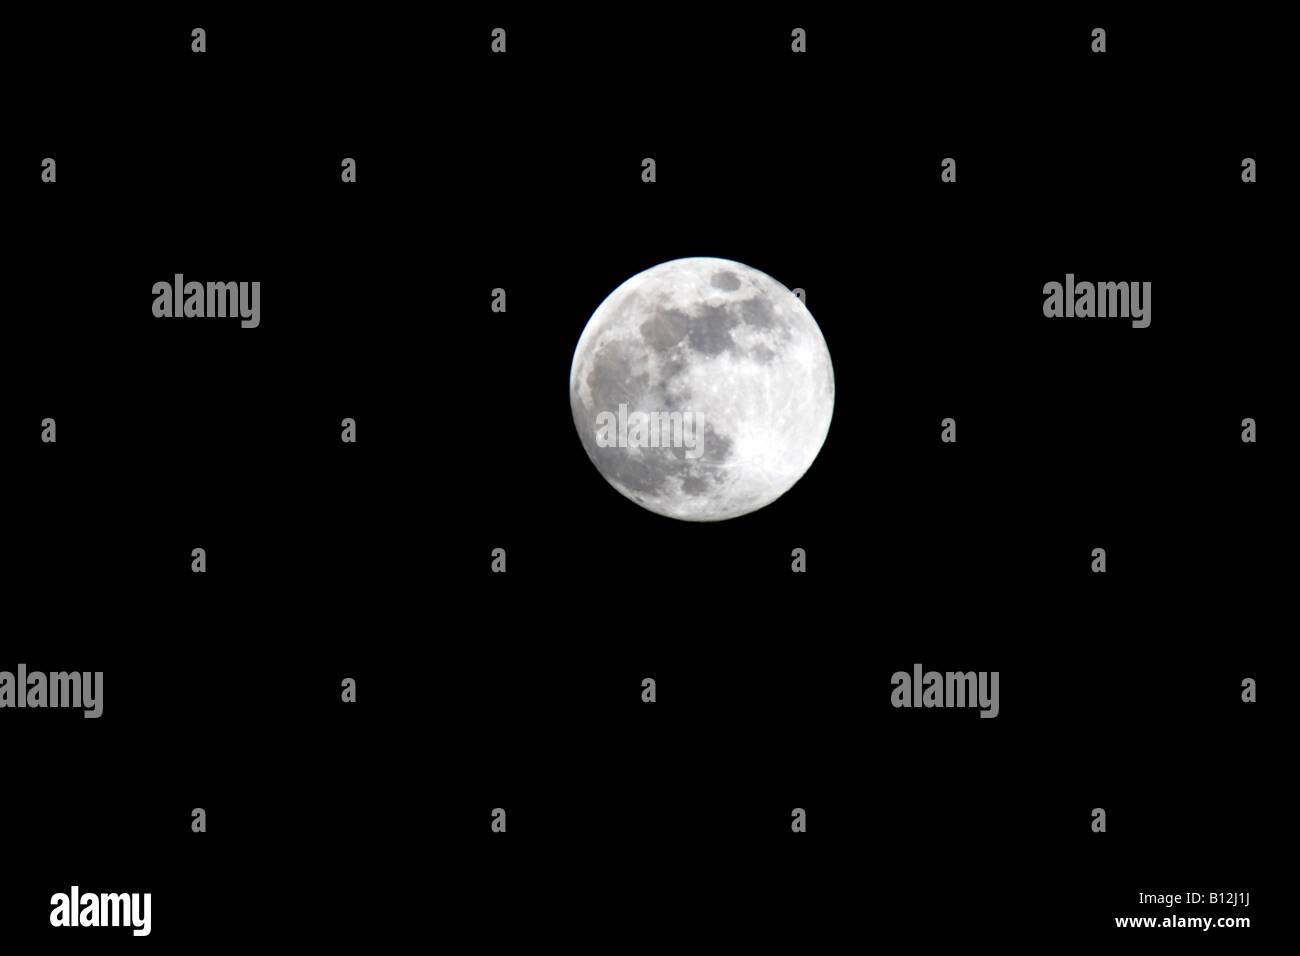 LARGE FULL MOON ON PLAIN BLACK SKY - Stock Image